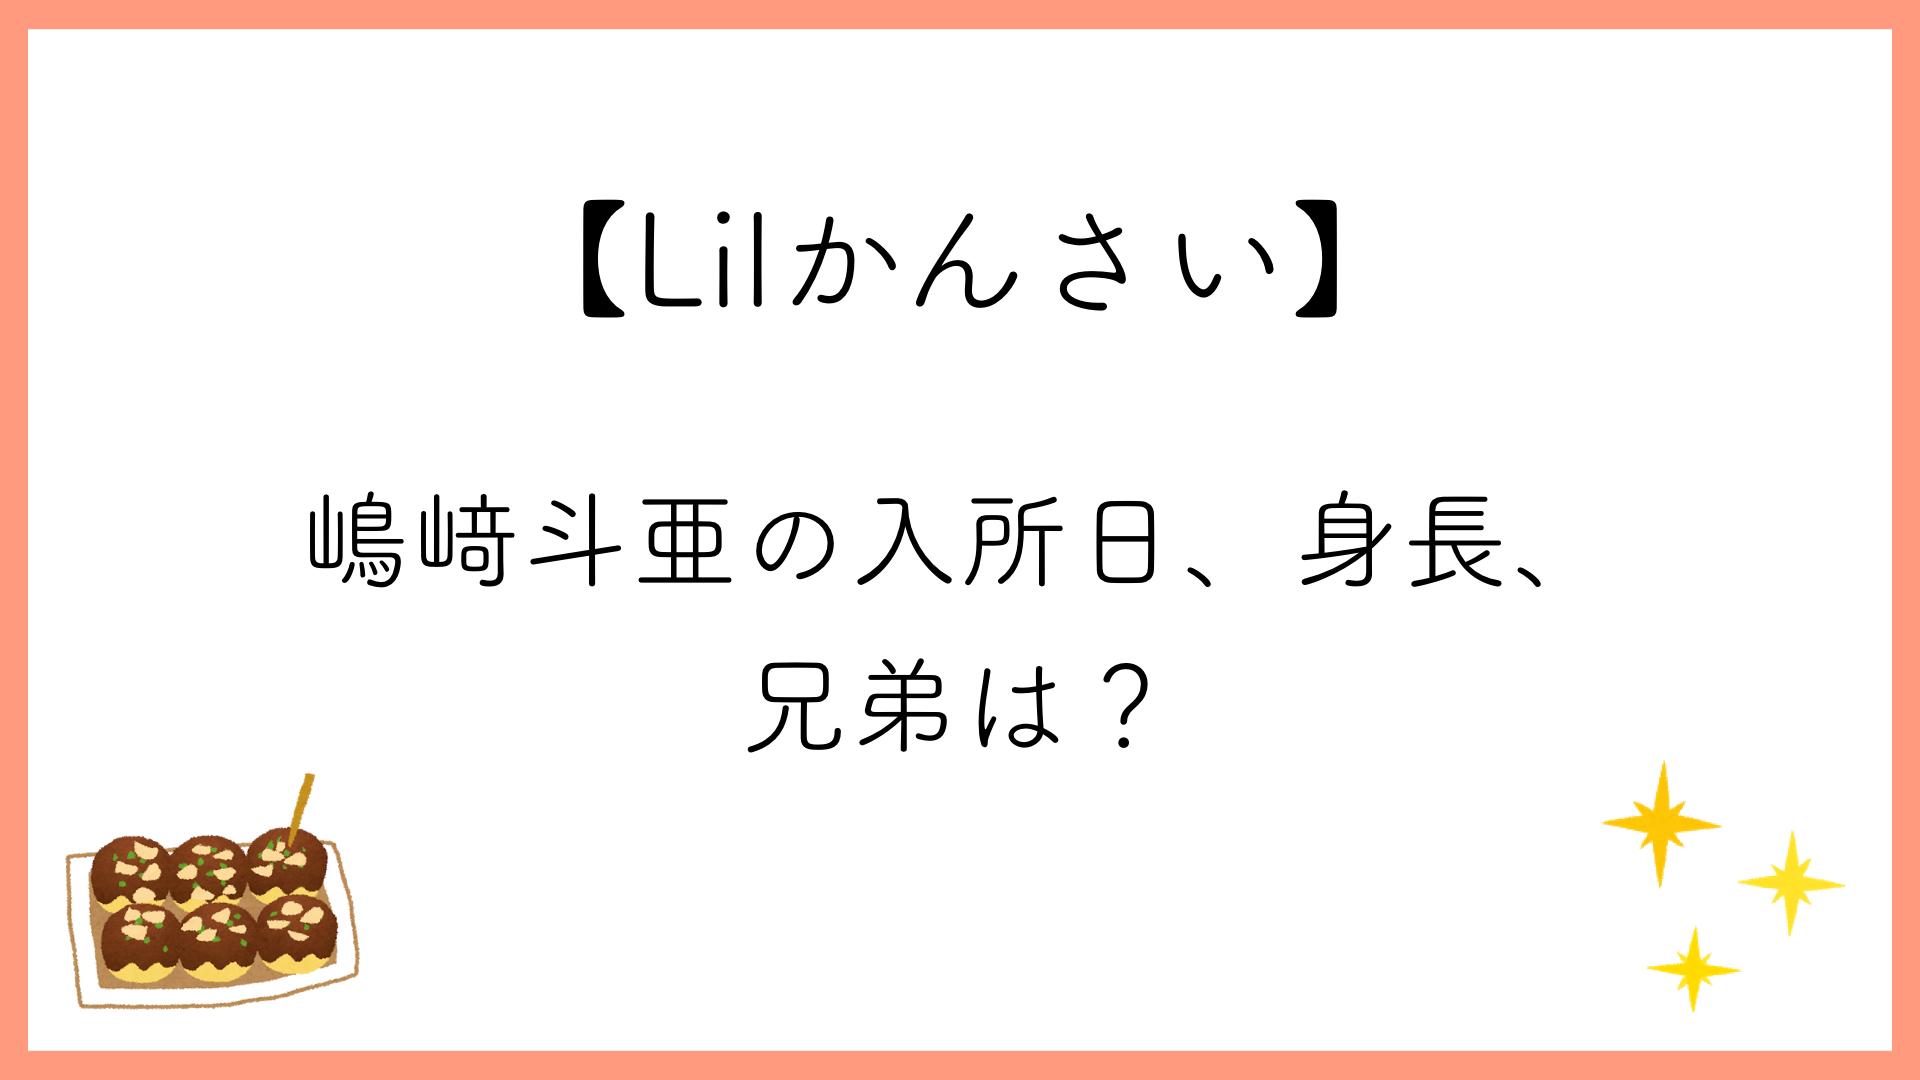 【Lilかんさい】嶋﨑斗亜の入所日、身長、兄弟は?